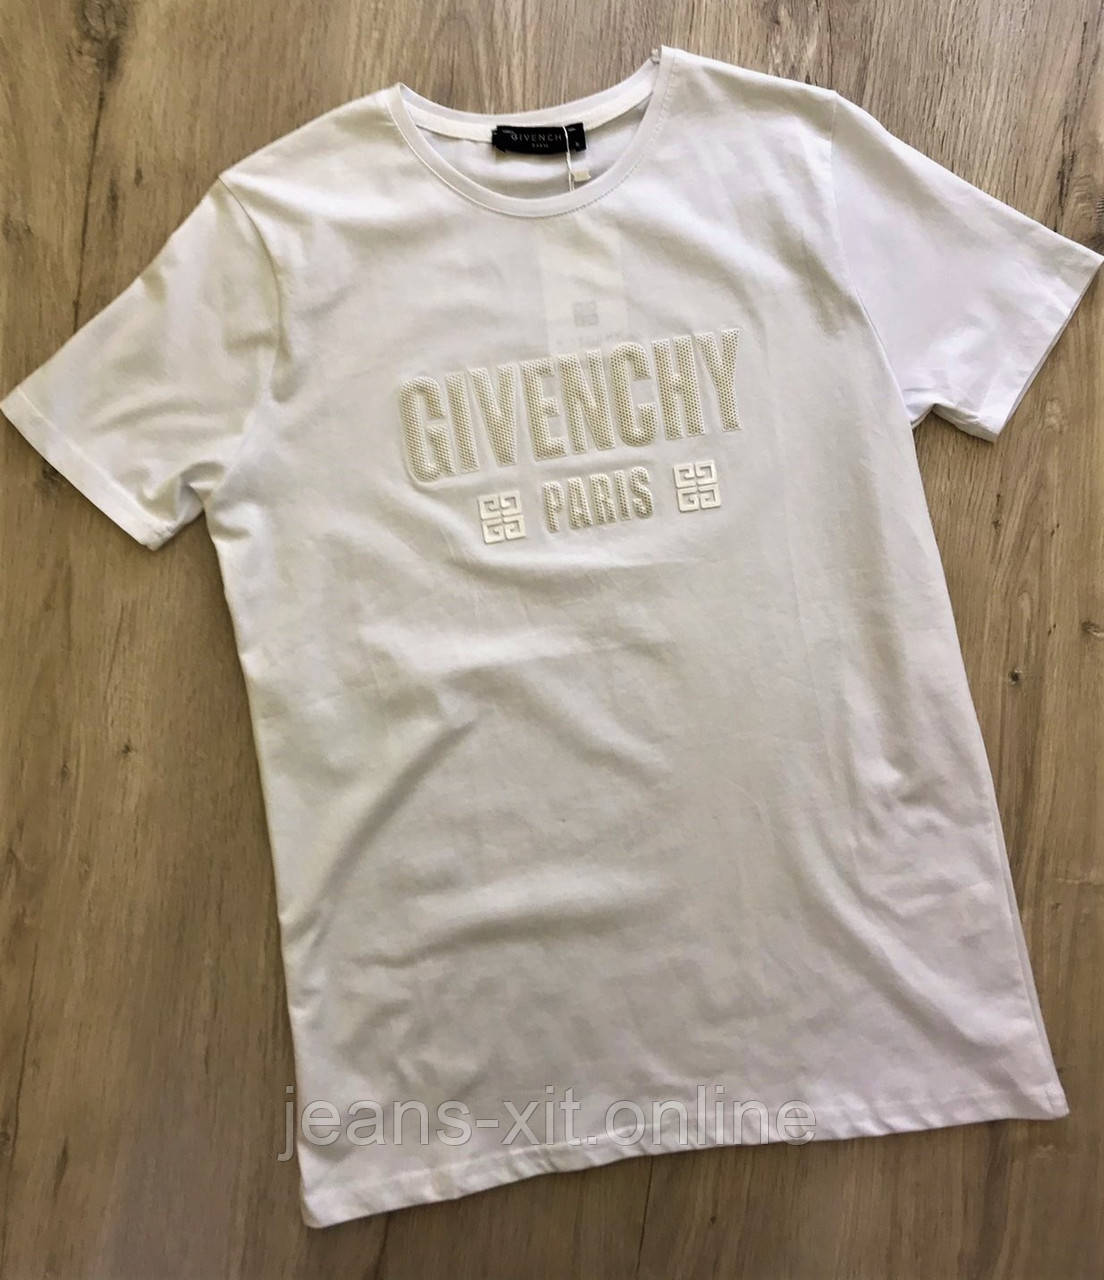 Футболка мужская L(р) белая 1720-20 Givenchy Турция Лето-C